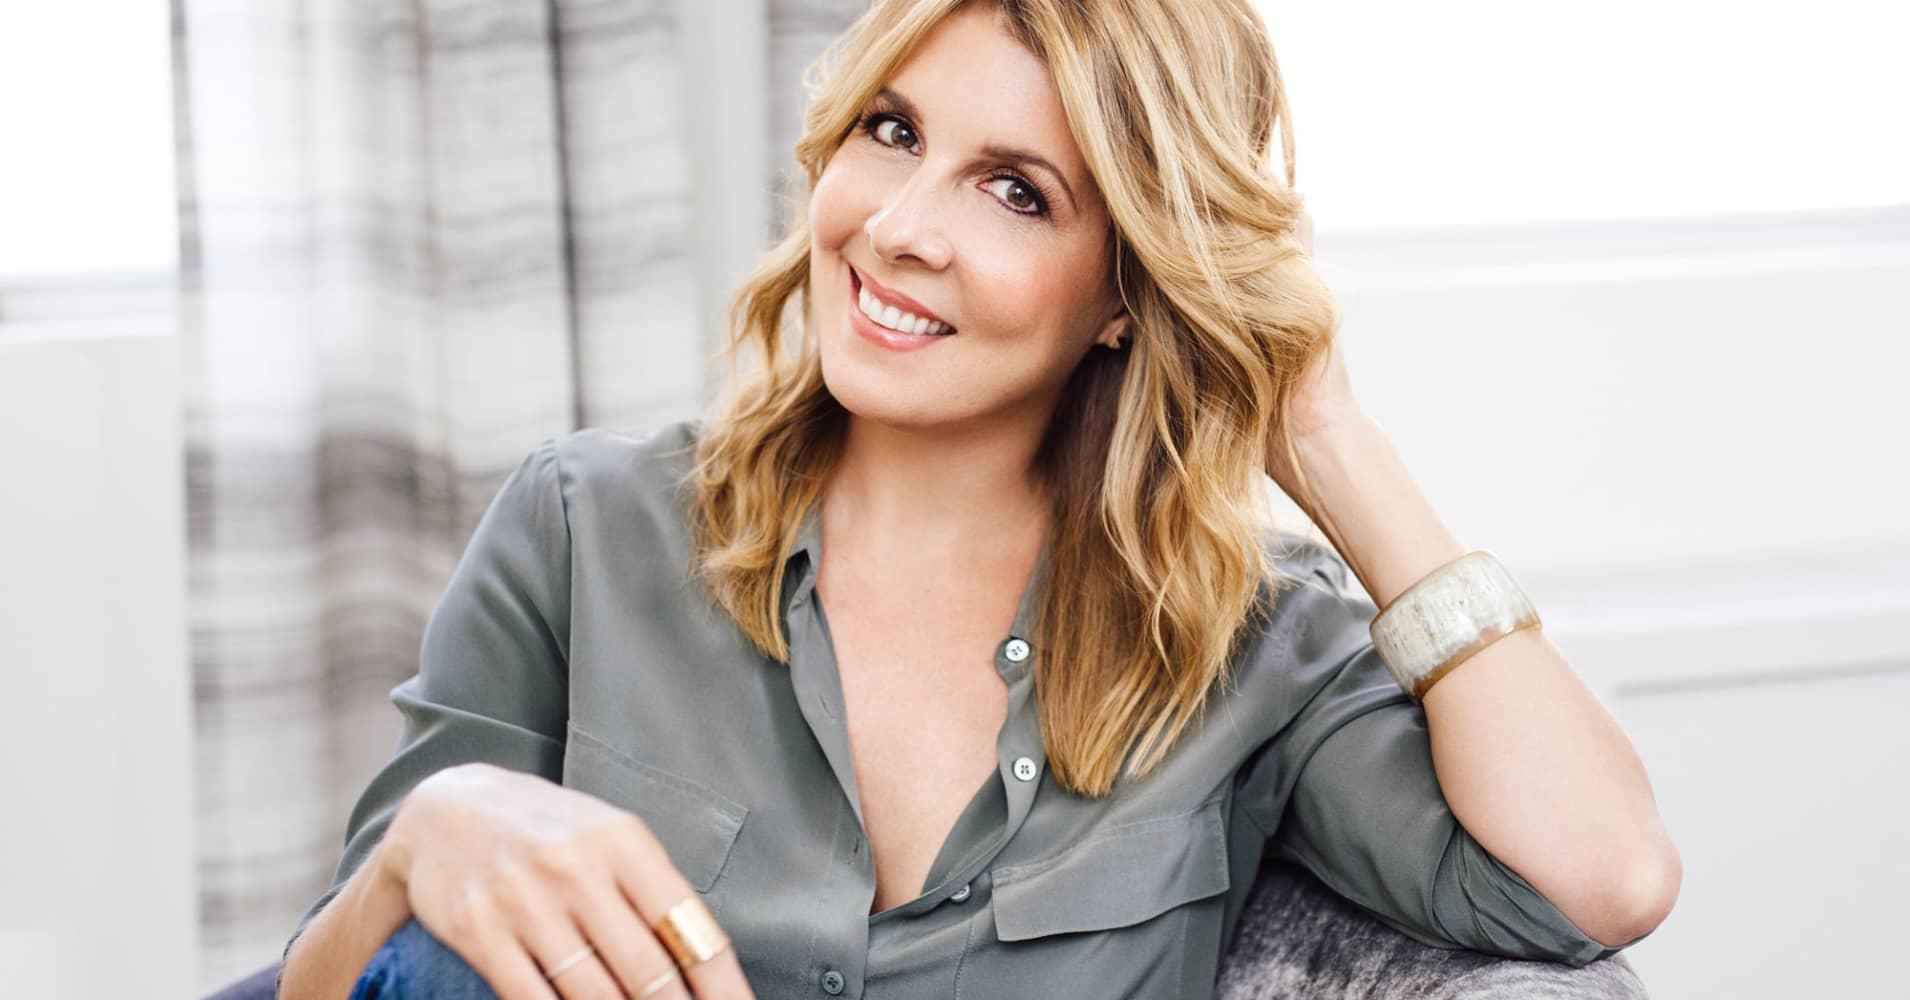 Michele Promaulayko, editor-in-chief, Cosmopolitan Magazine